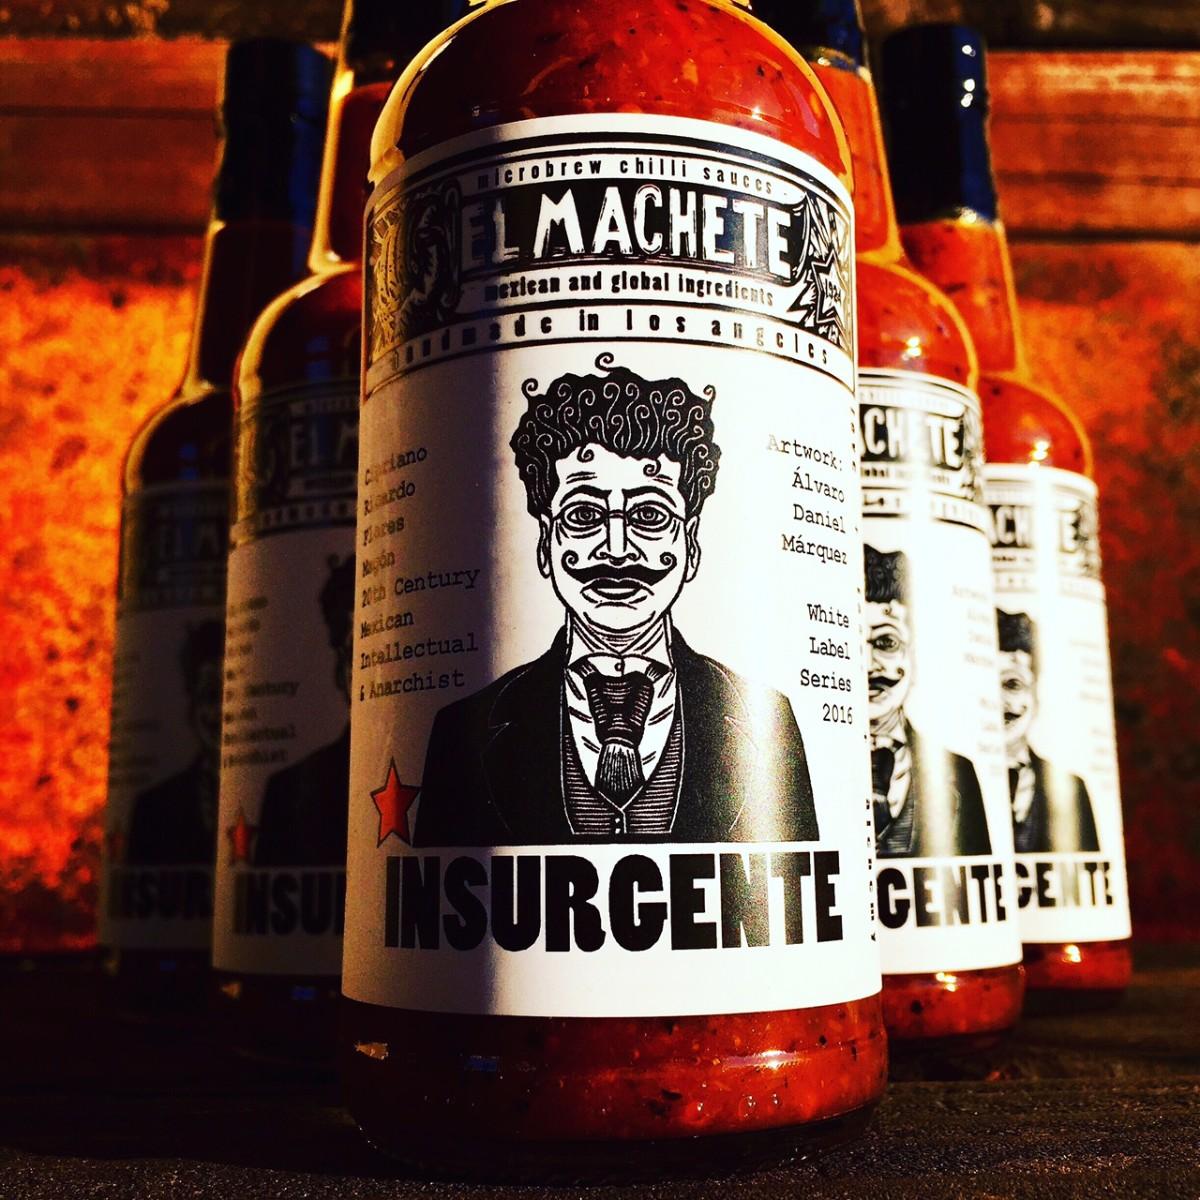 The Insurgente hot sauce uses artwork by Alvaro Daniel Marquez | Courtesy of El Machete